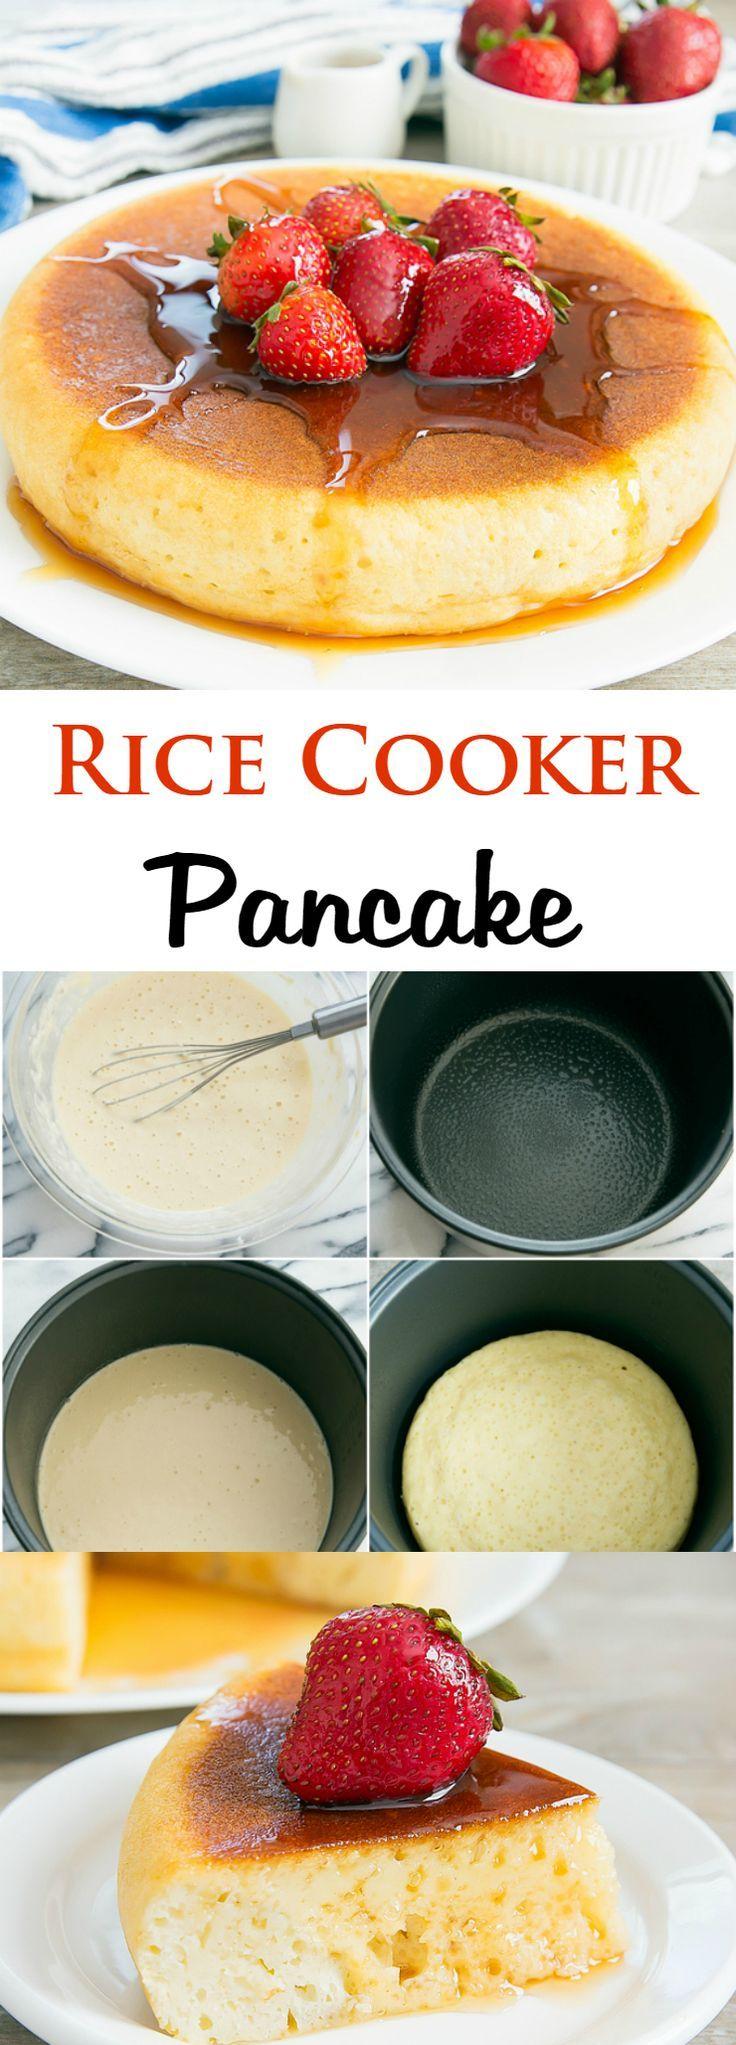 wolfgang puck rice cooker recipes pdf